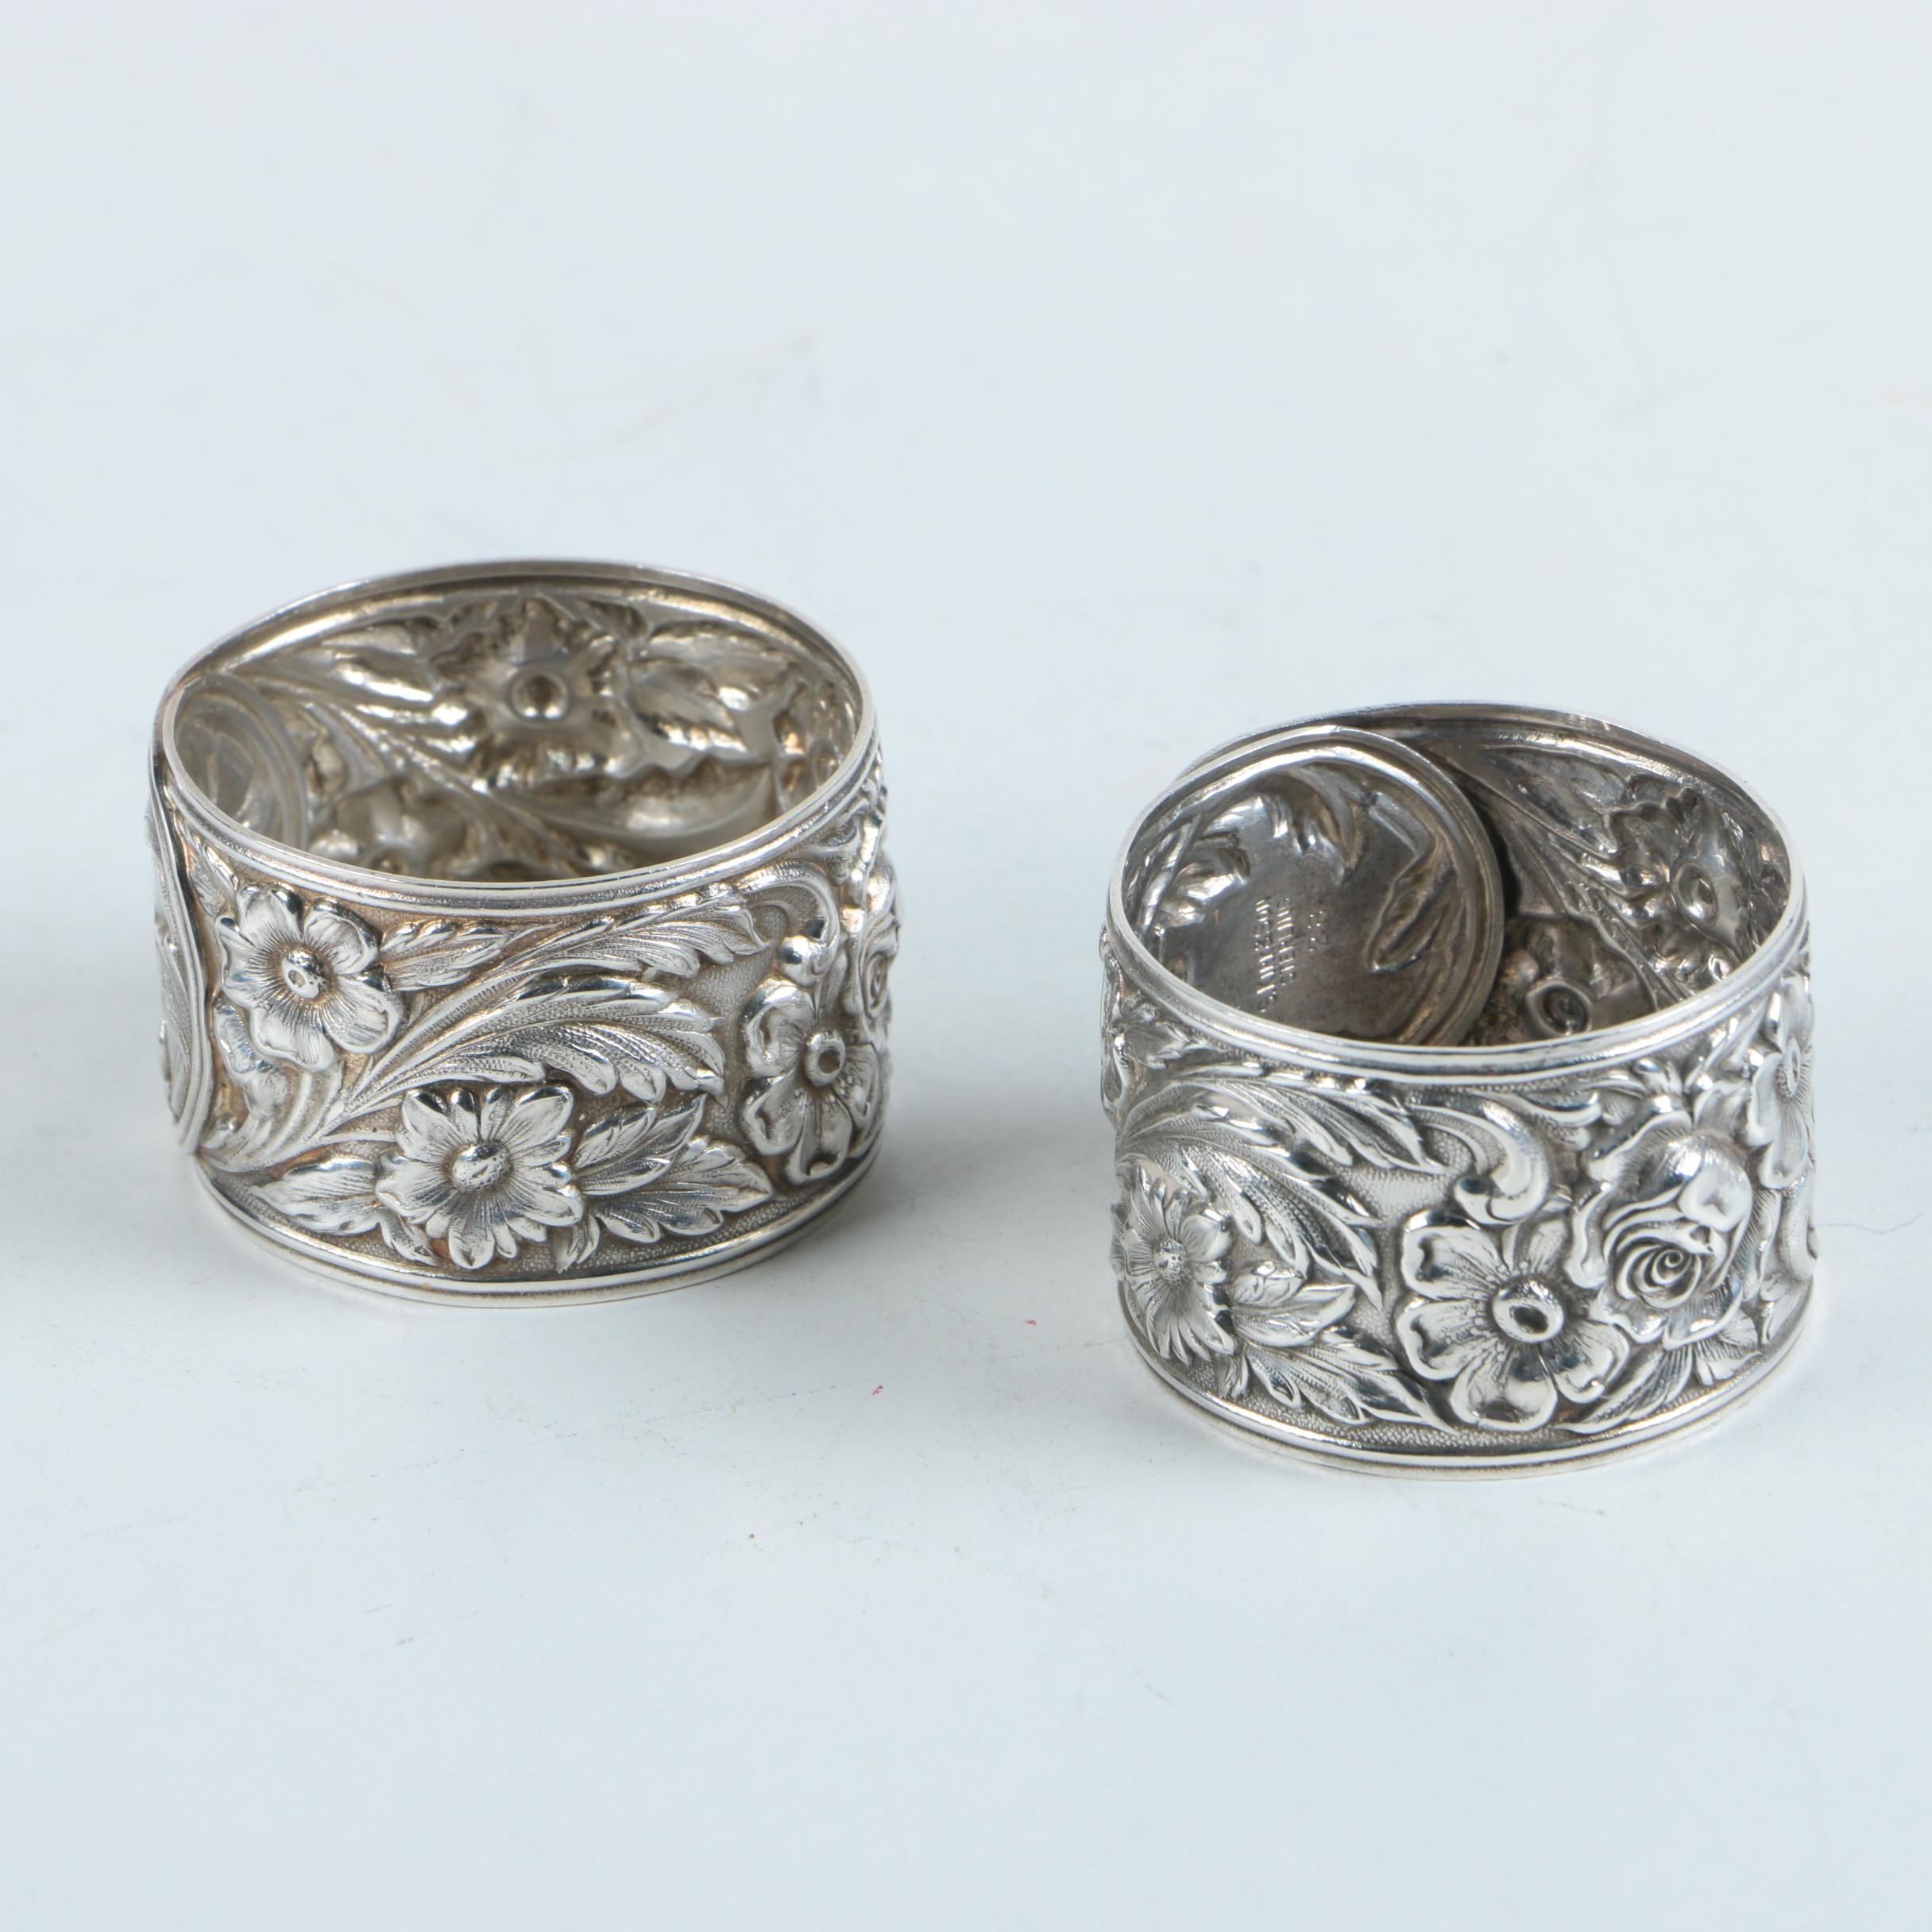 S. Kirk & Son Arabesque Repoussé Sterling Silver Napkin Rings